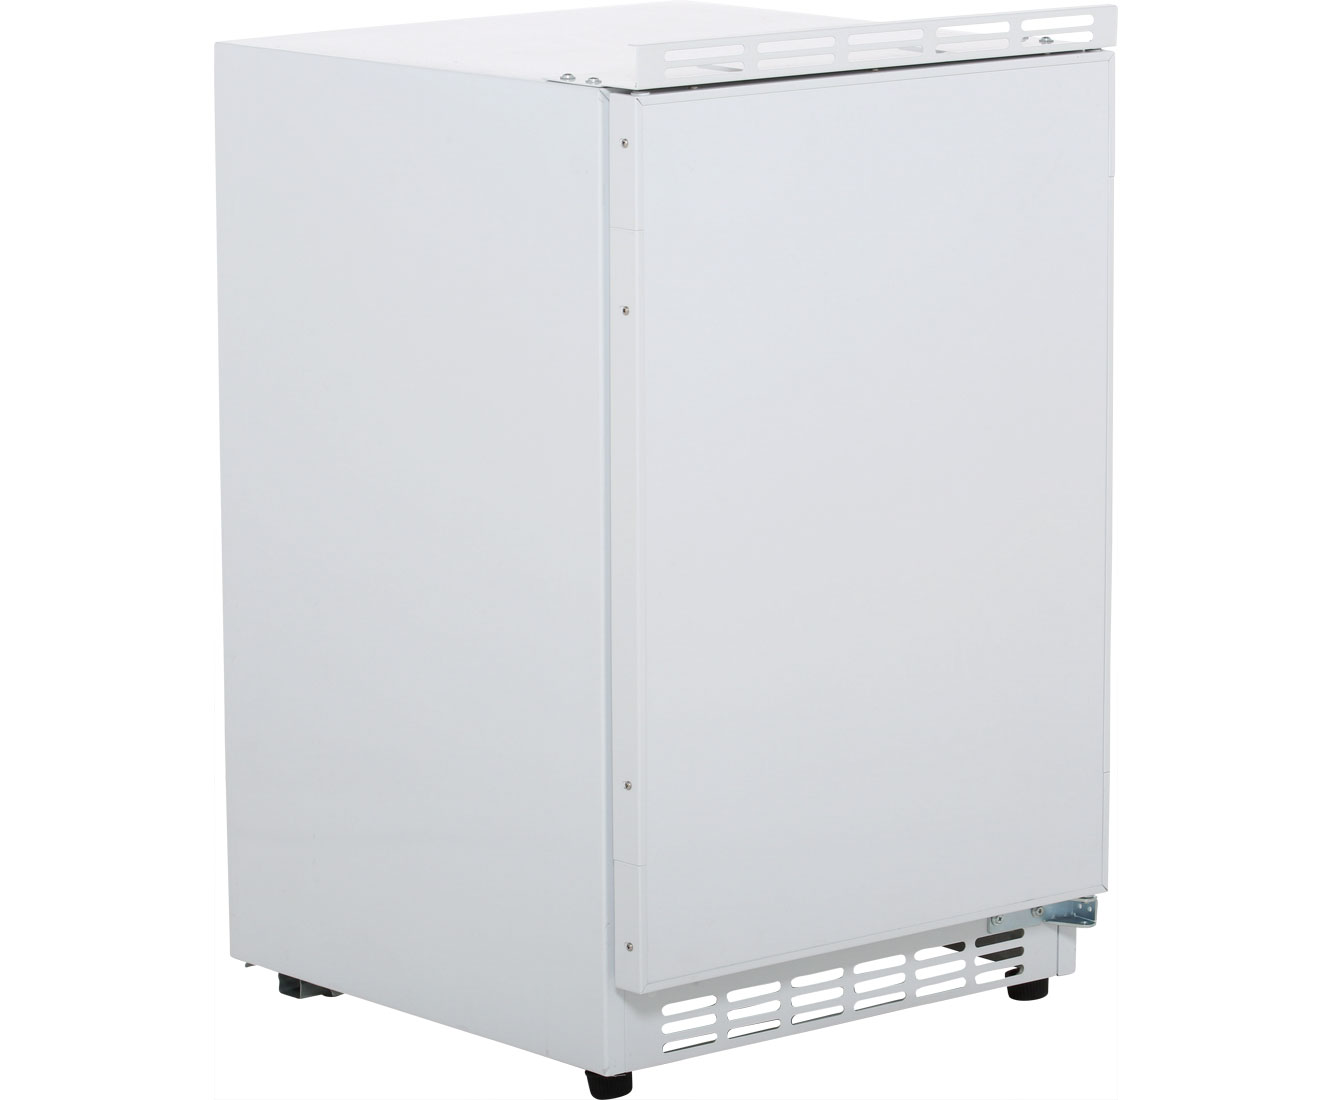 Bomann Kühlschrank Bei Real : Kühlschrank a siemens ki31rvf30 iq300 einbau kühlschrank a 102 1